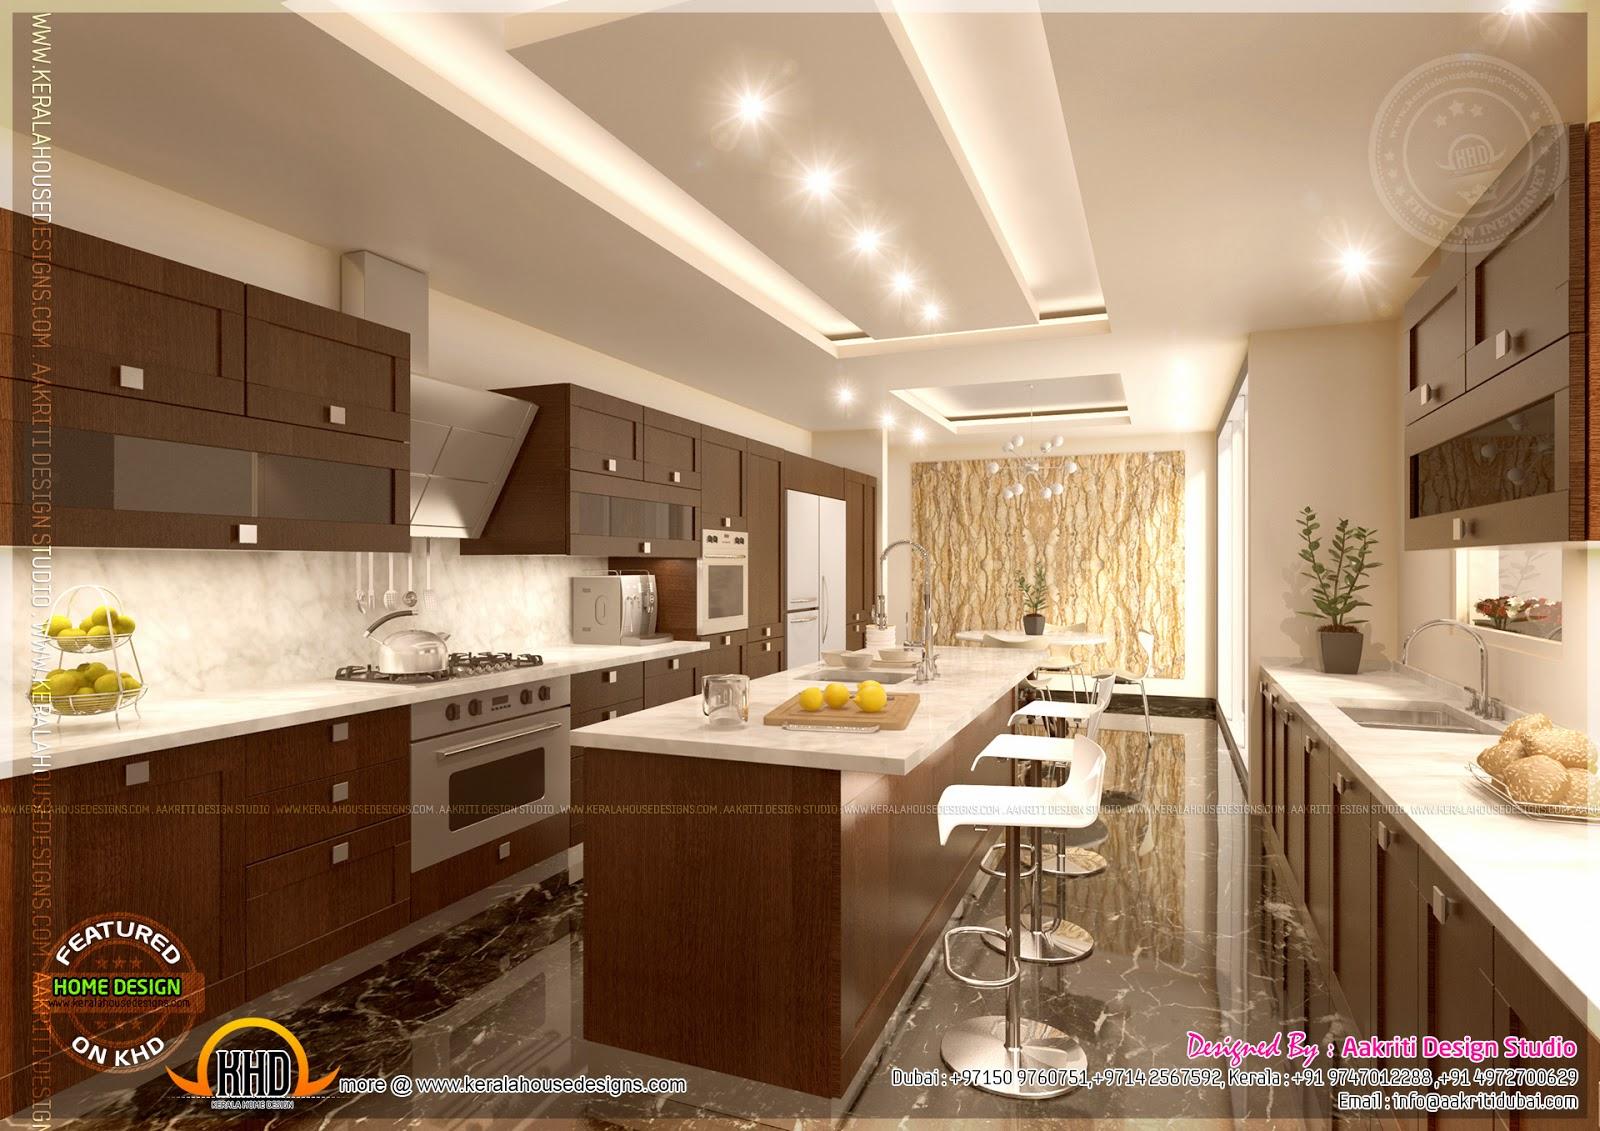 Kitchen designs by Aakriti Design Studio - Kerala home design and ...